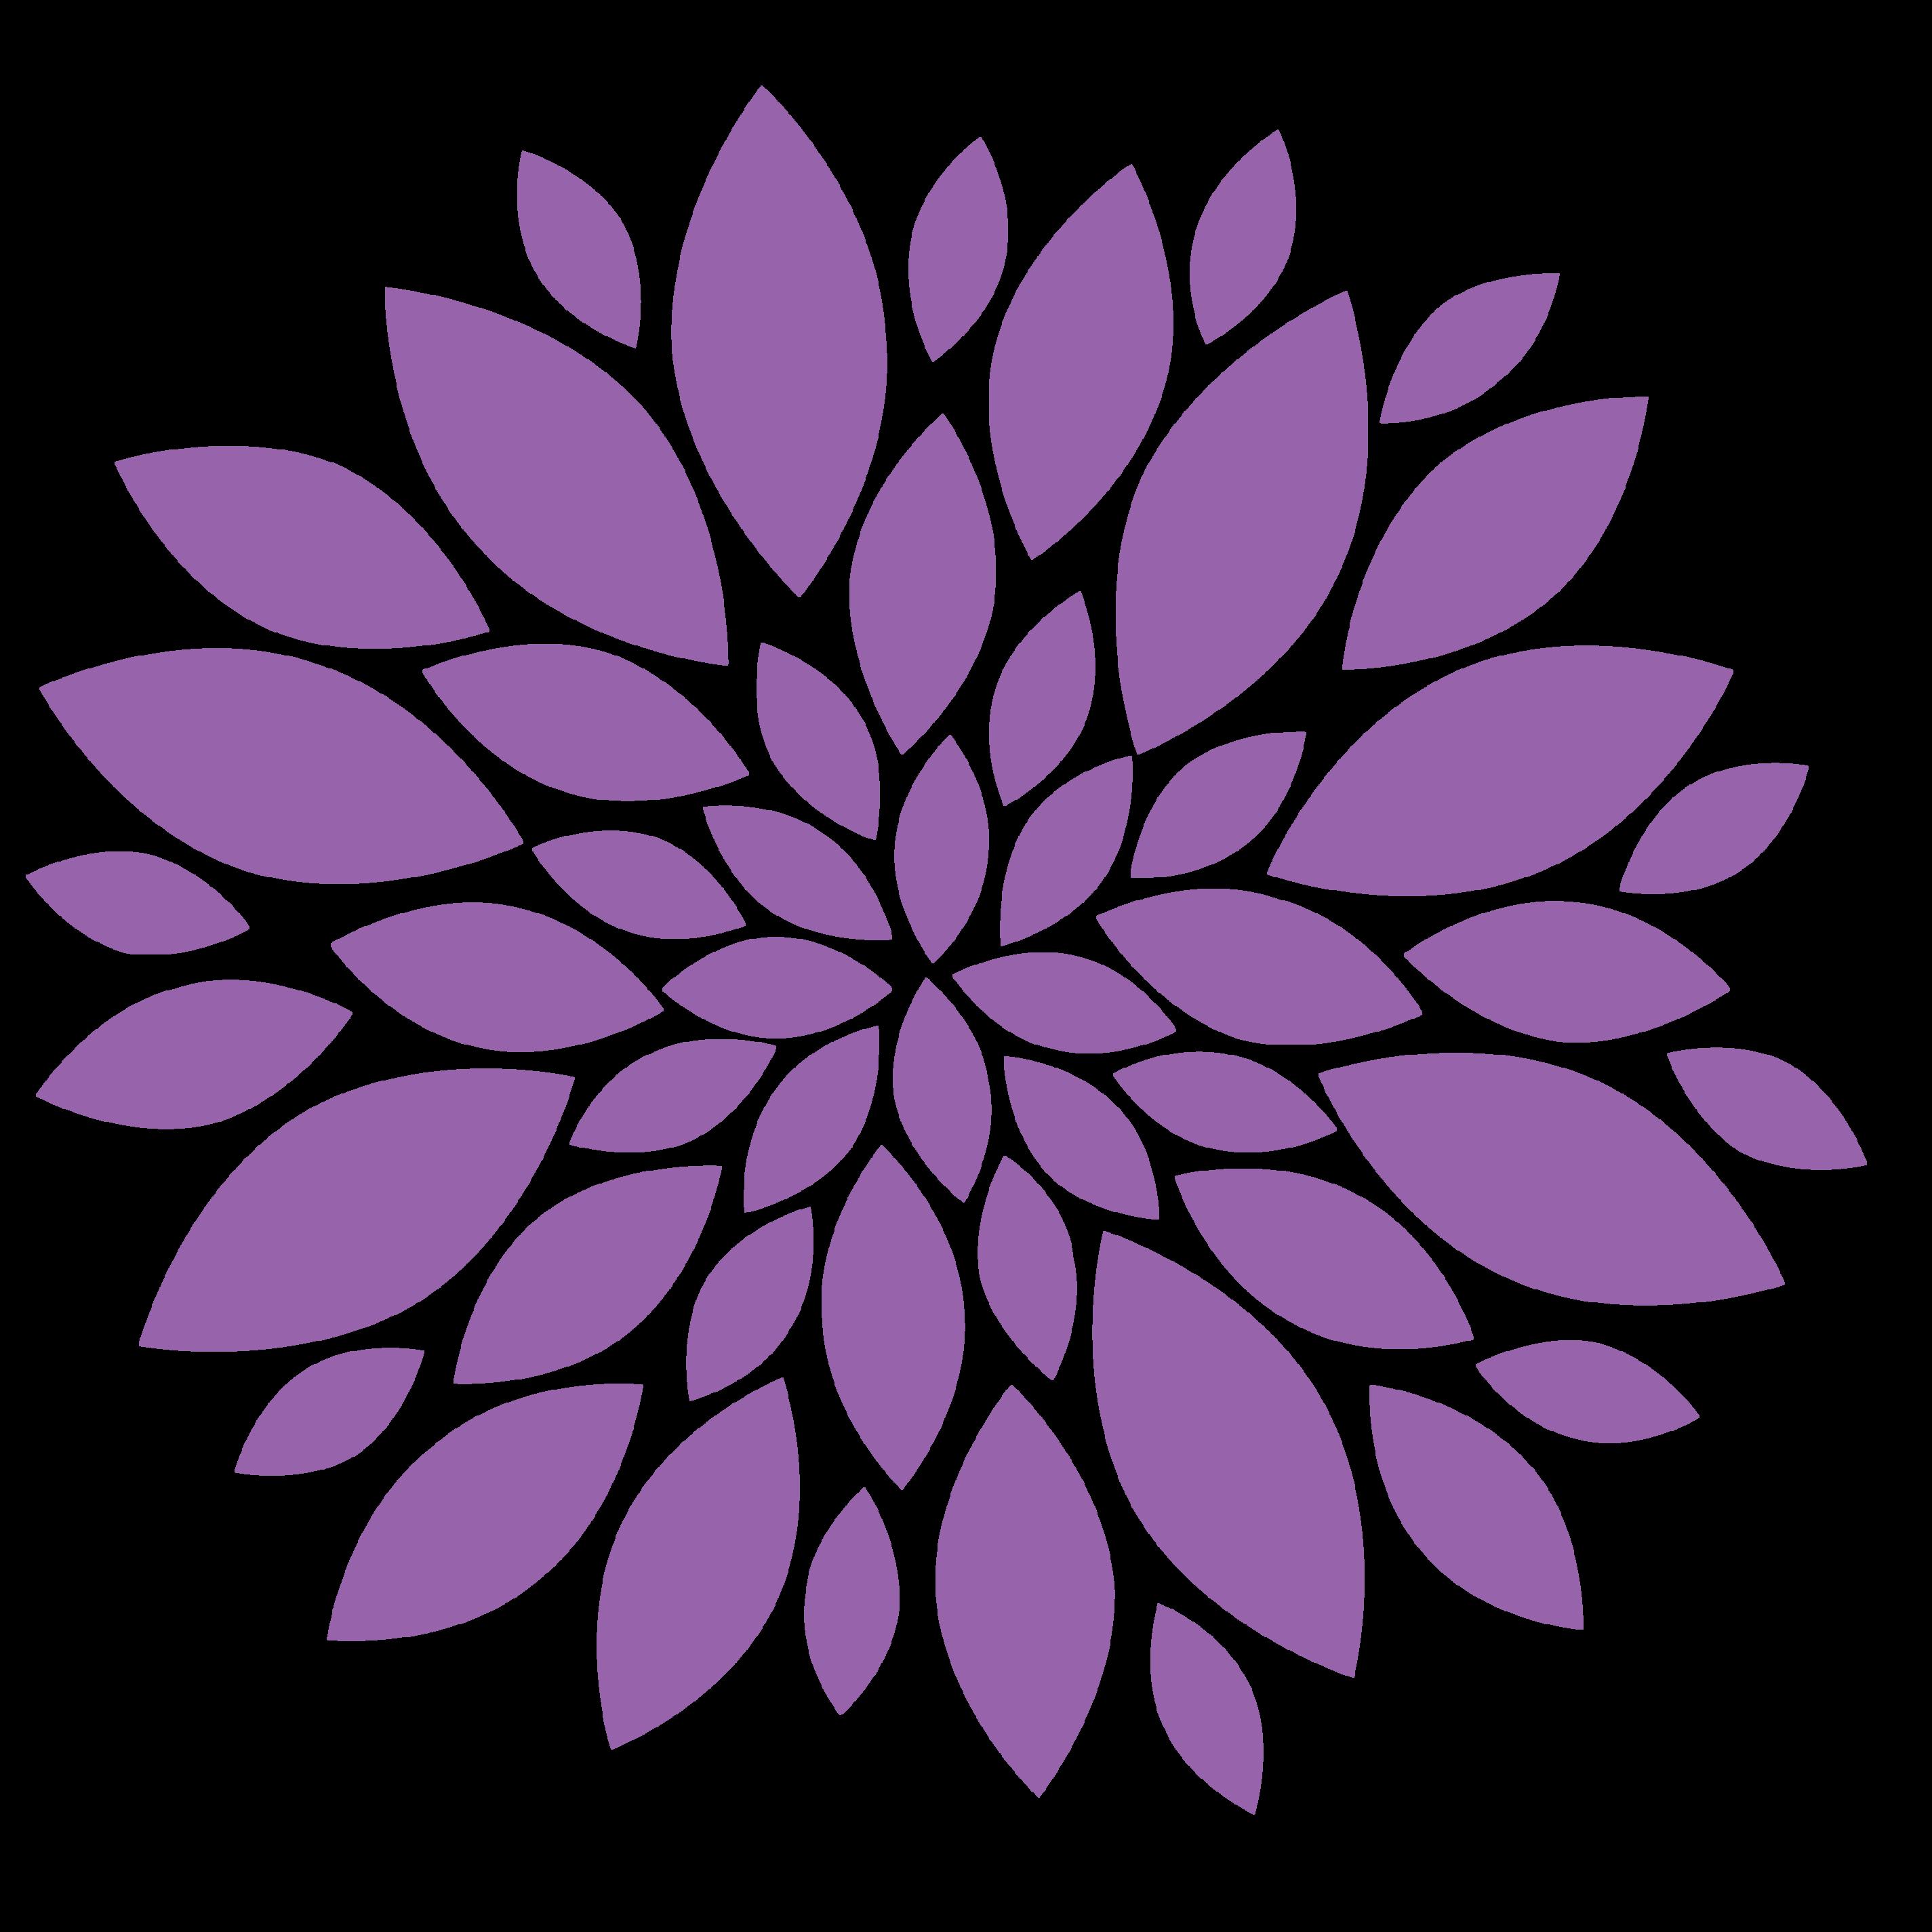 Purple Flower clipart Flower Flower Collections Flowers Art